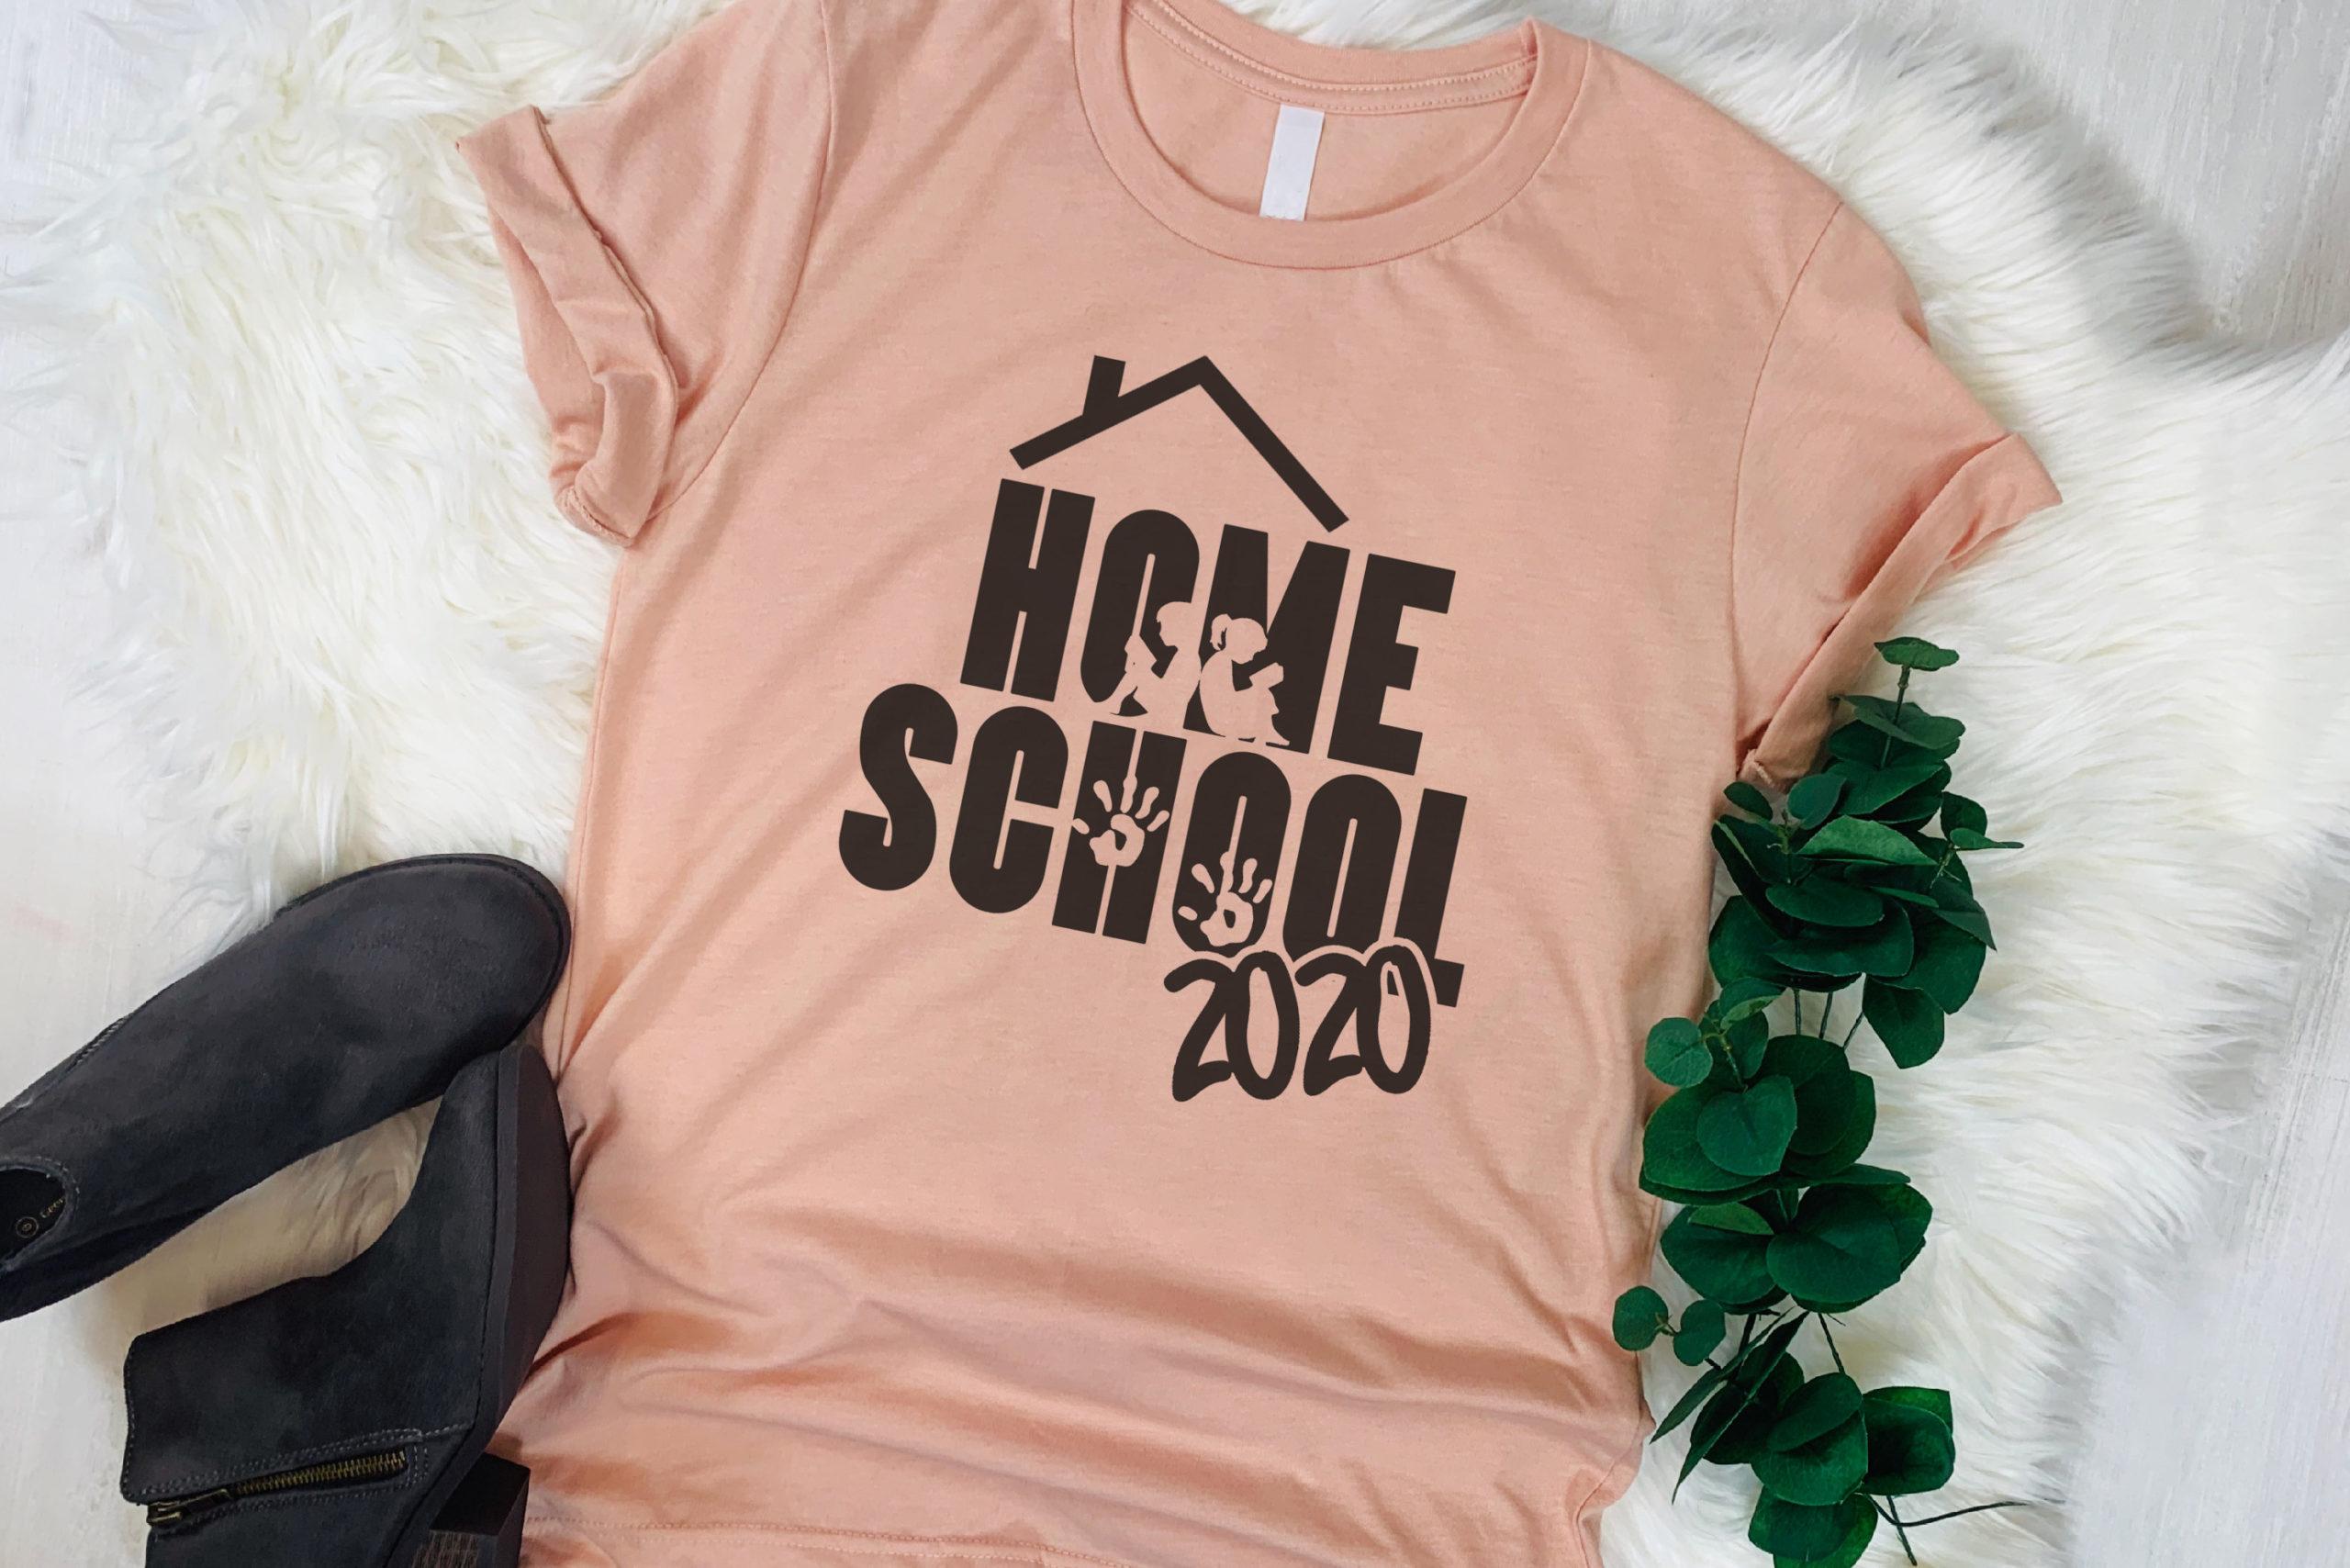 Free Home School 2020 SVG File